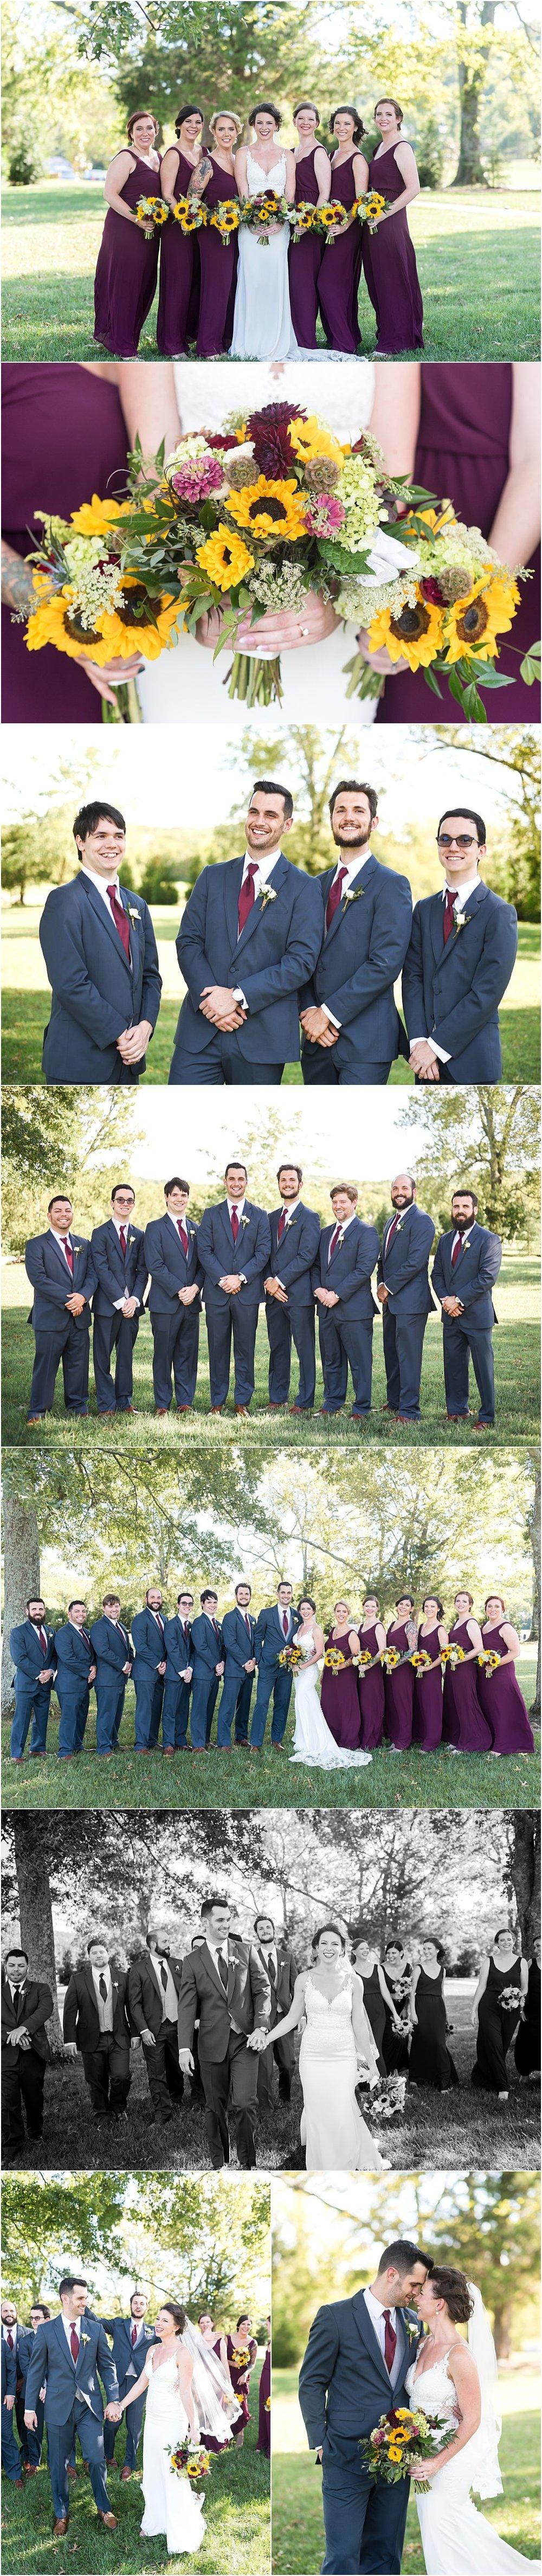 Jordan-and-Anna-Ravenswood-Mansion-Wedding-in-Brentwood-TN-Nashville-Wedding-Photographers+4